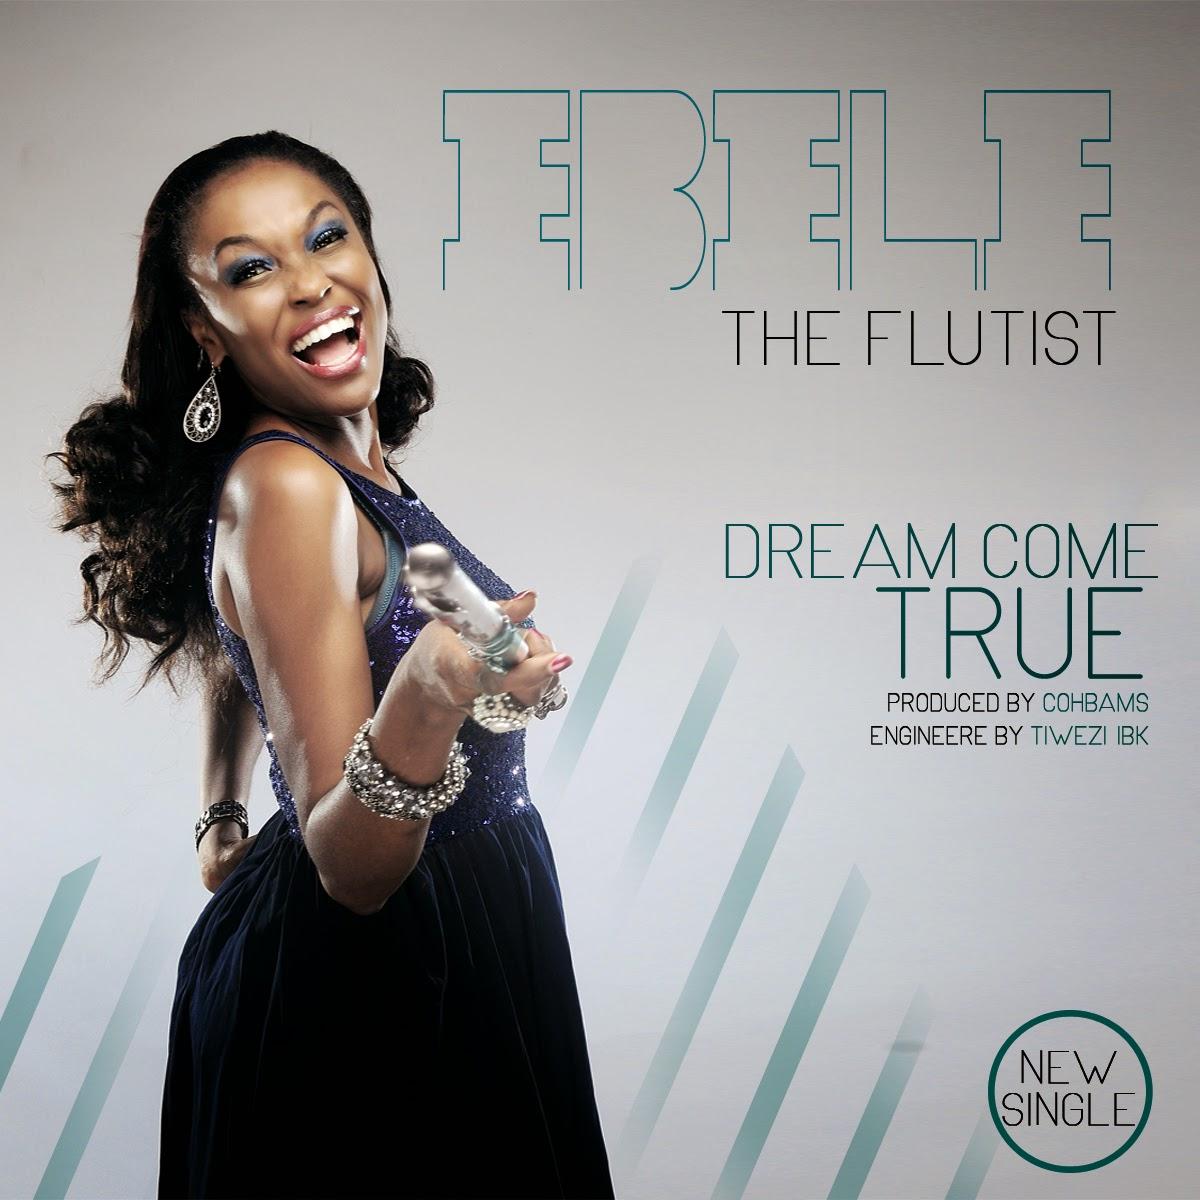 Ebele The Flutist